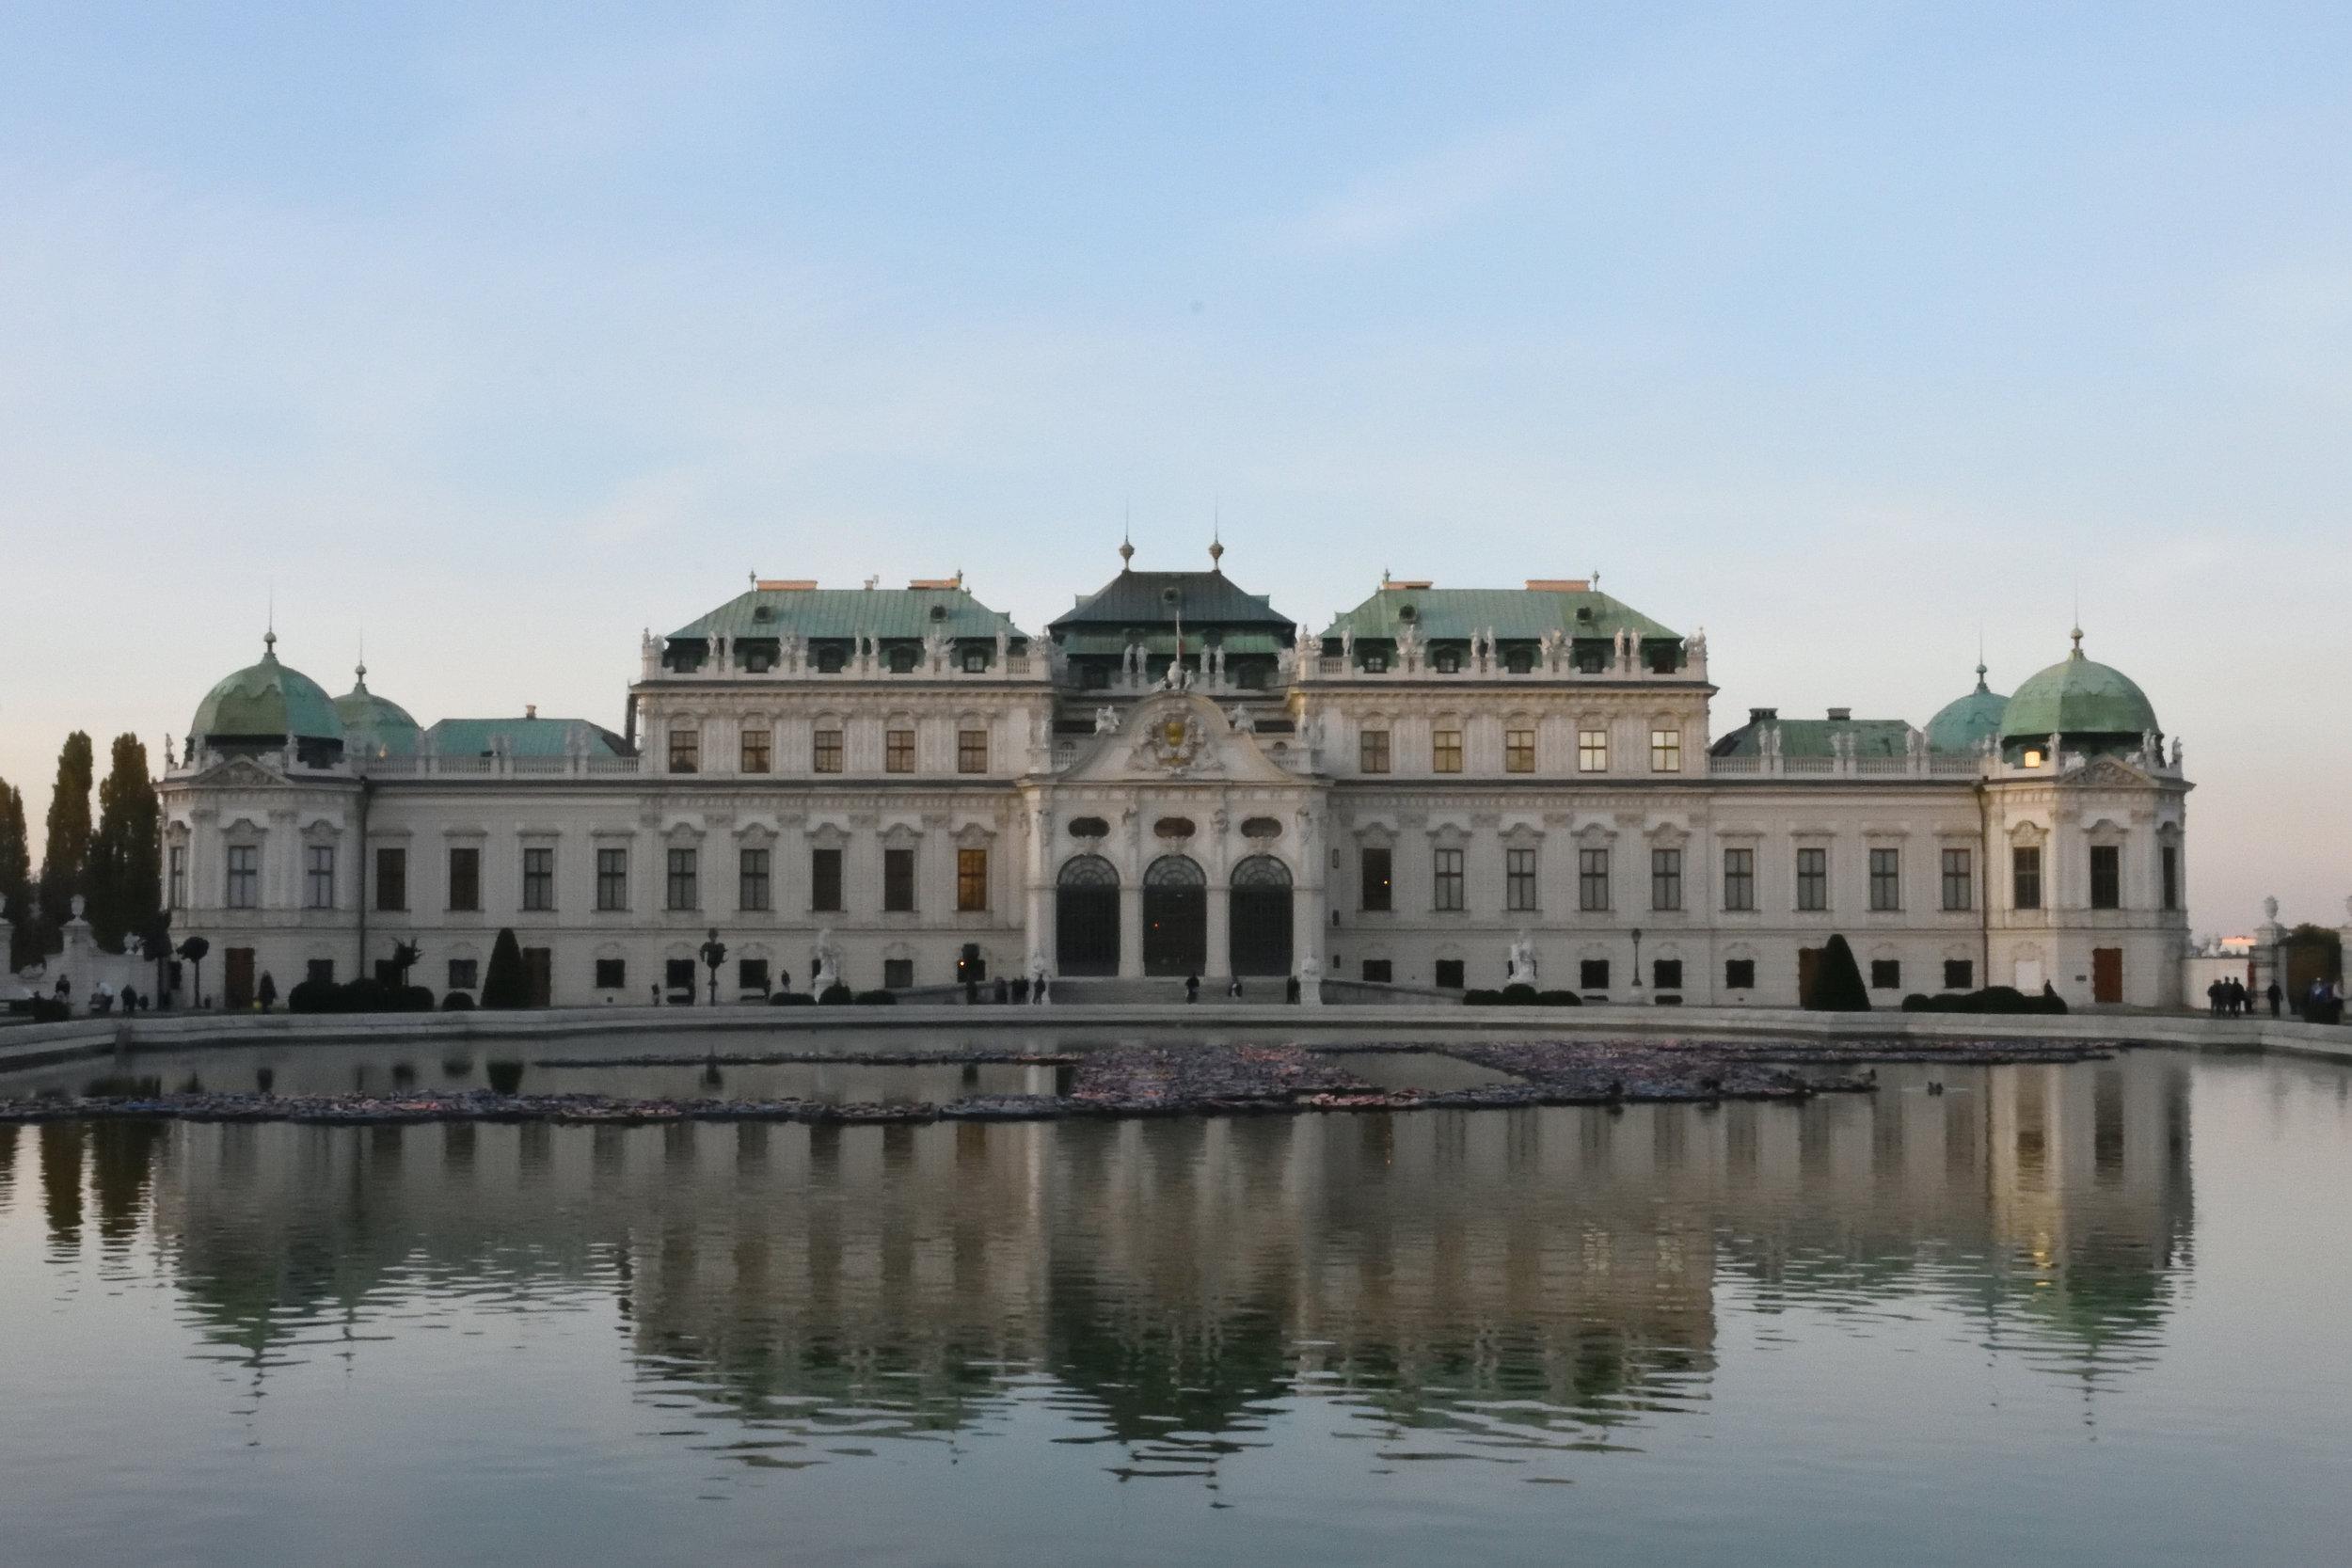 Schloss Belvedere, Vienna 2016